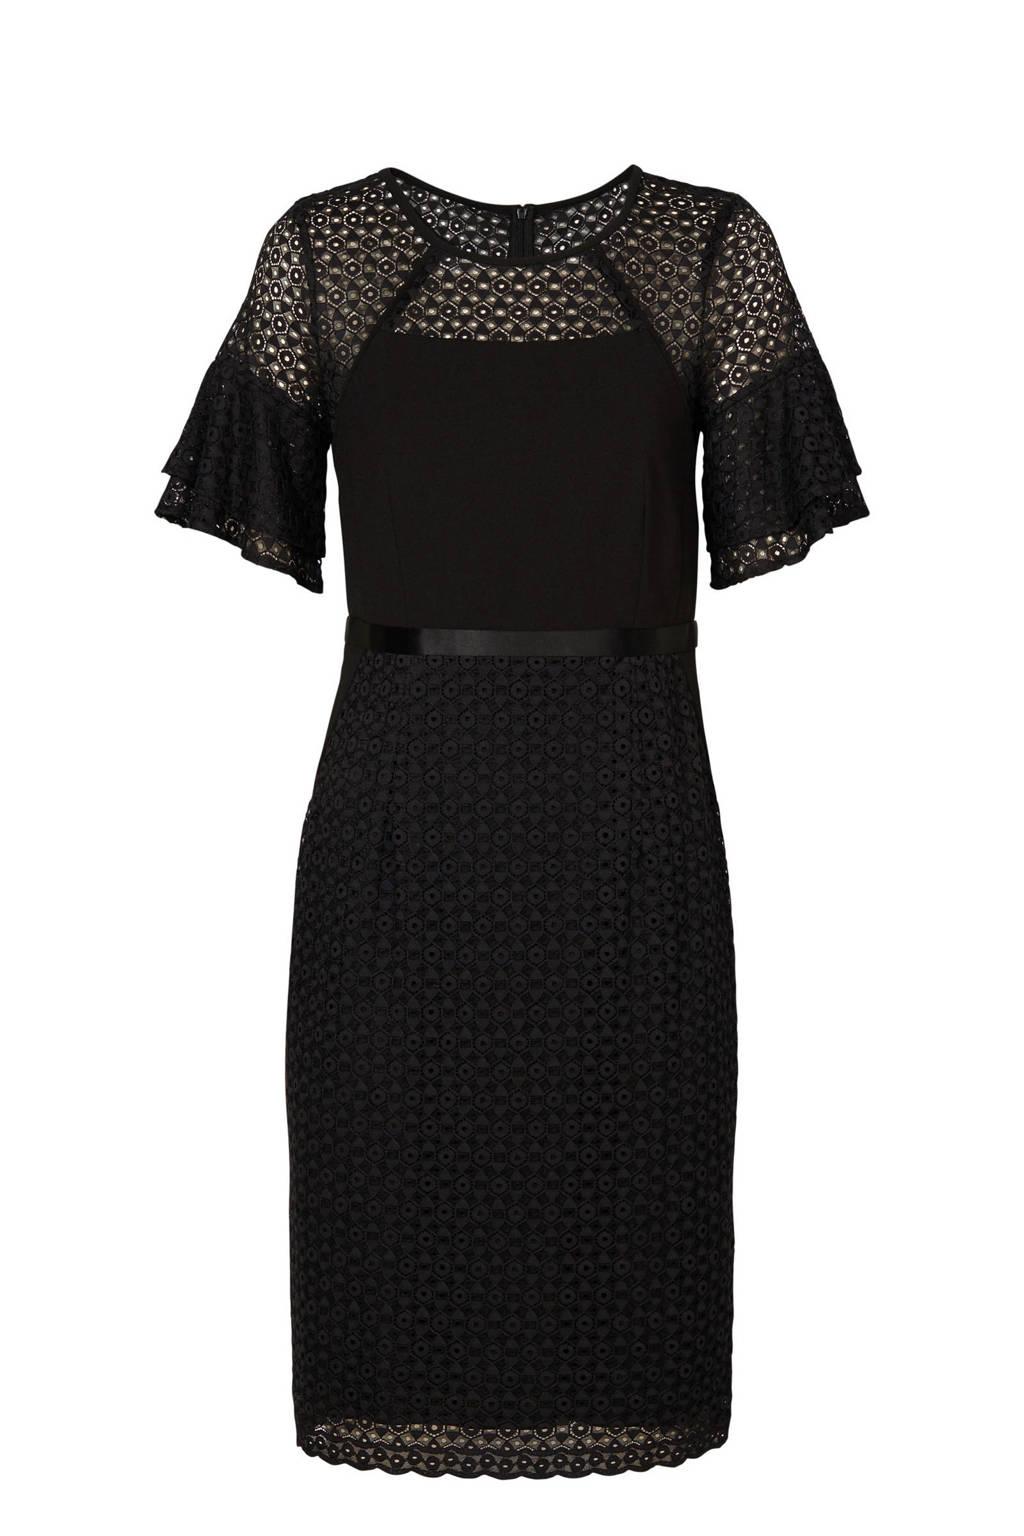 Mart Visser jurk met kant zwart, Zwart